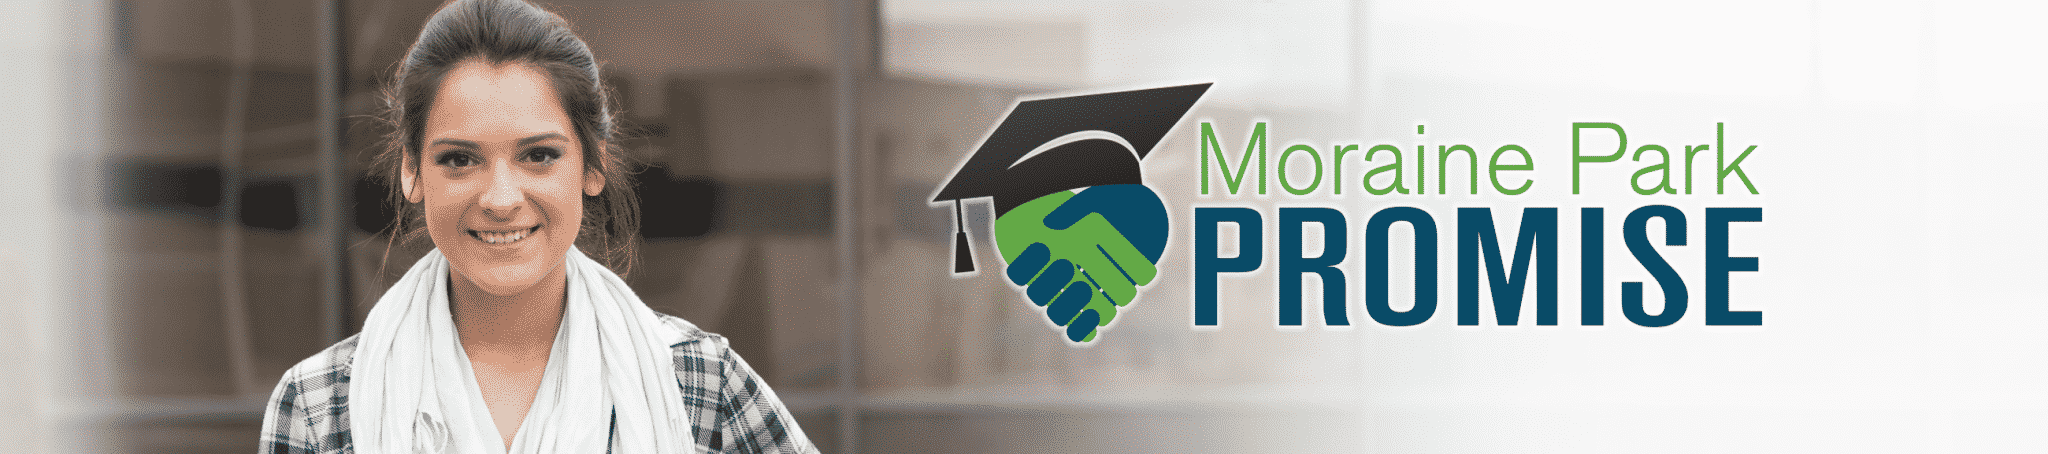 Promise program